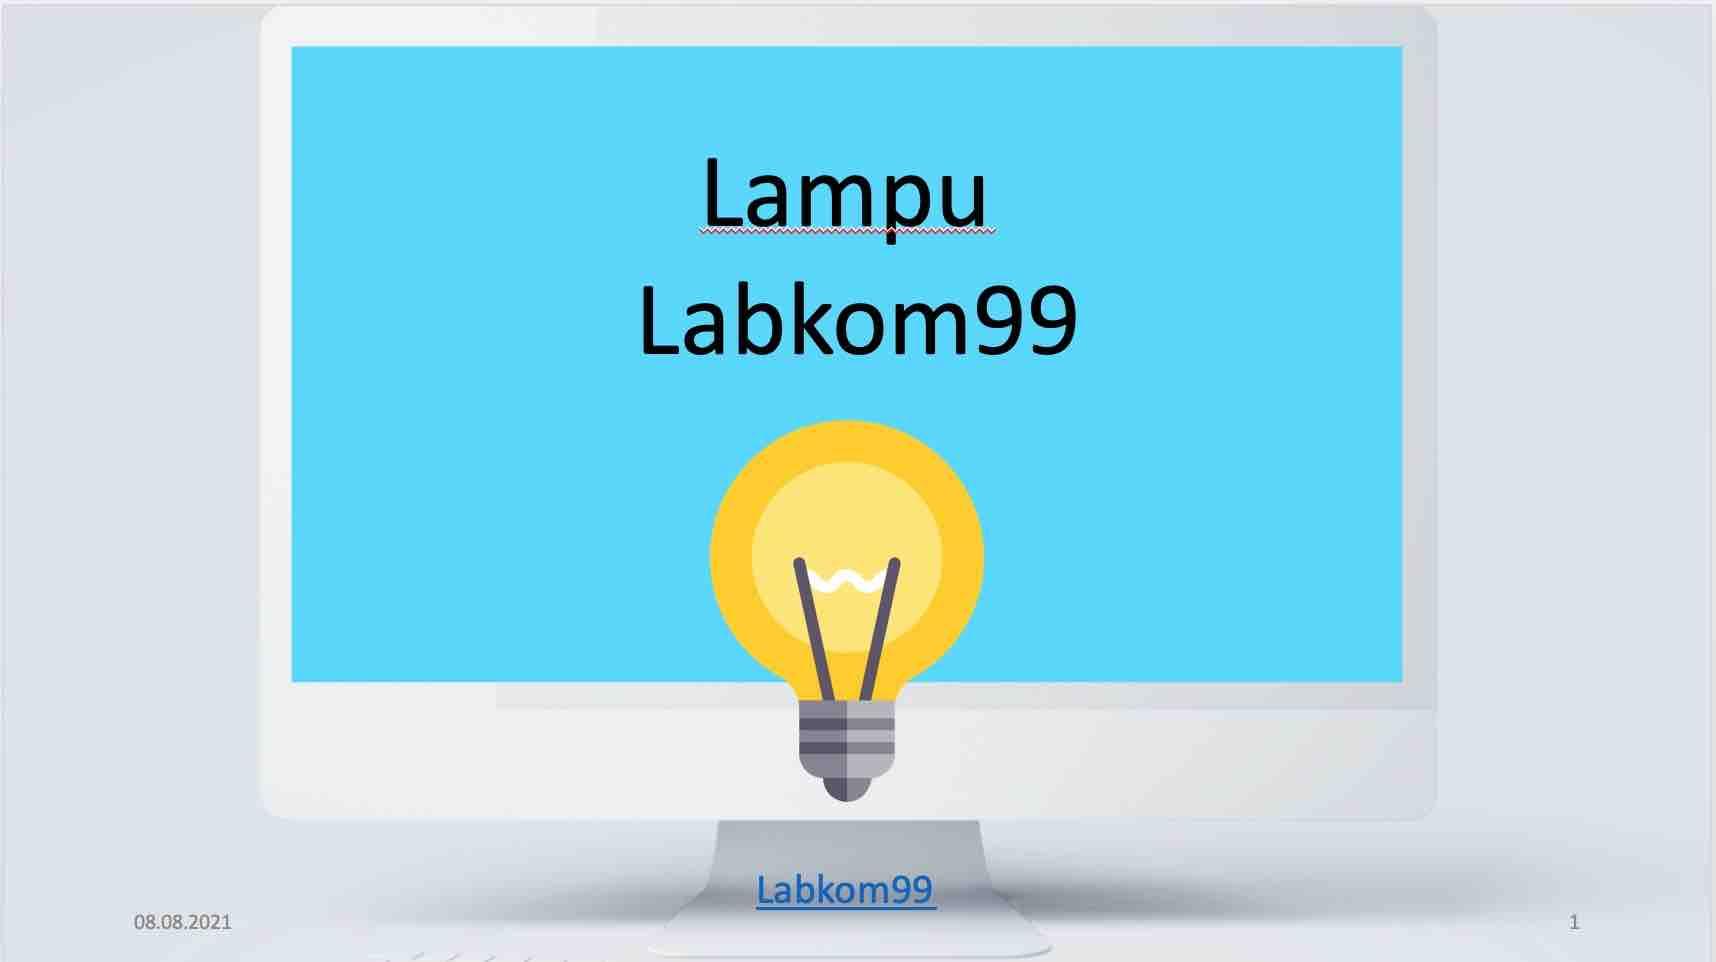 Lampu - Labkom99